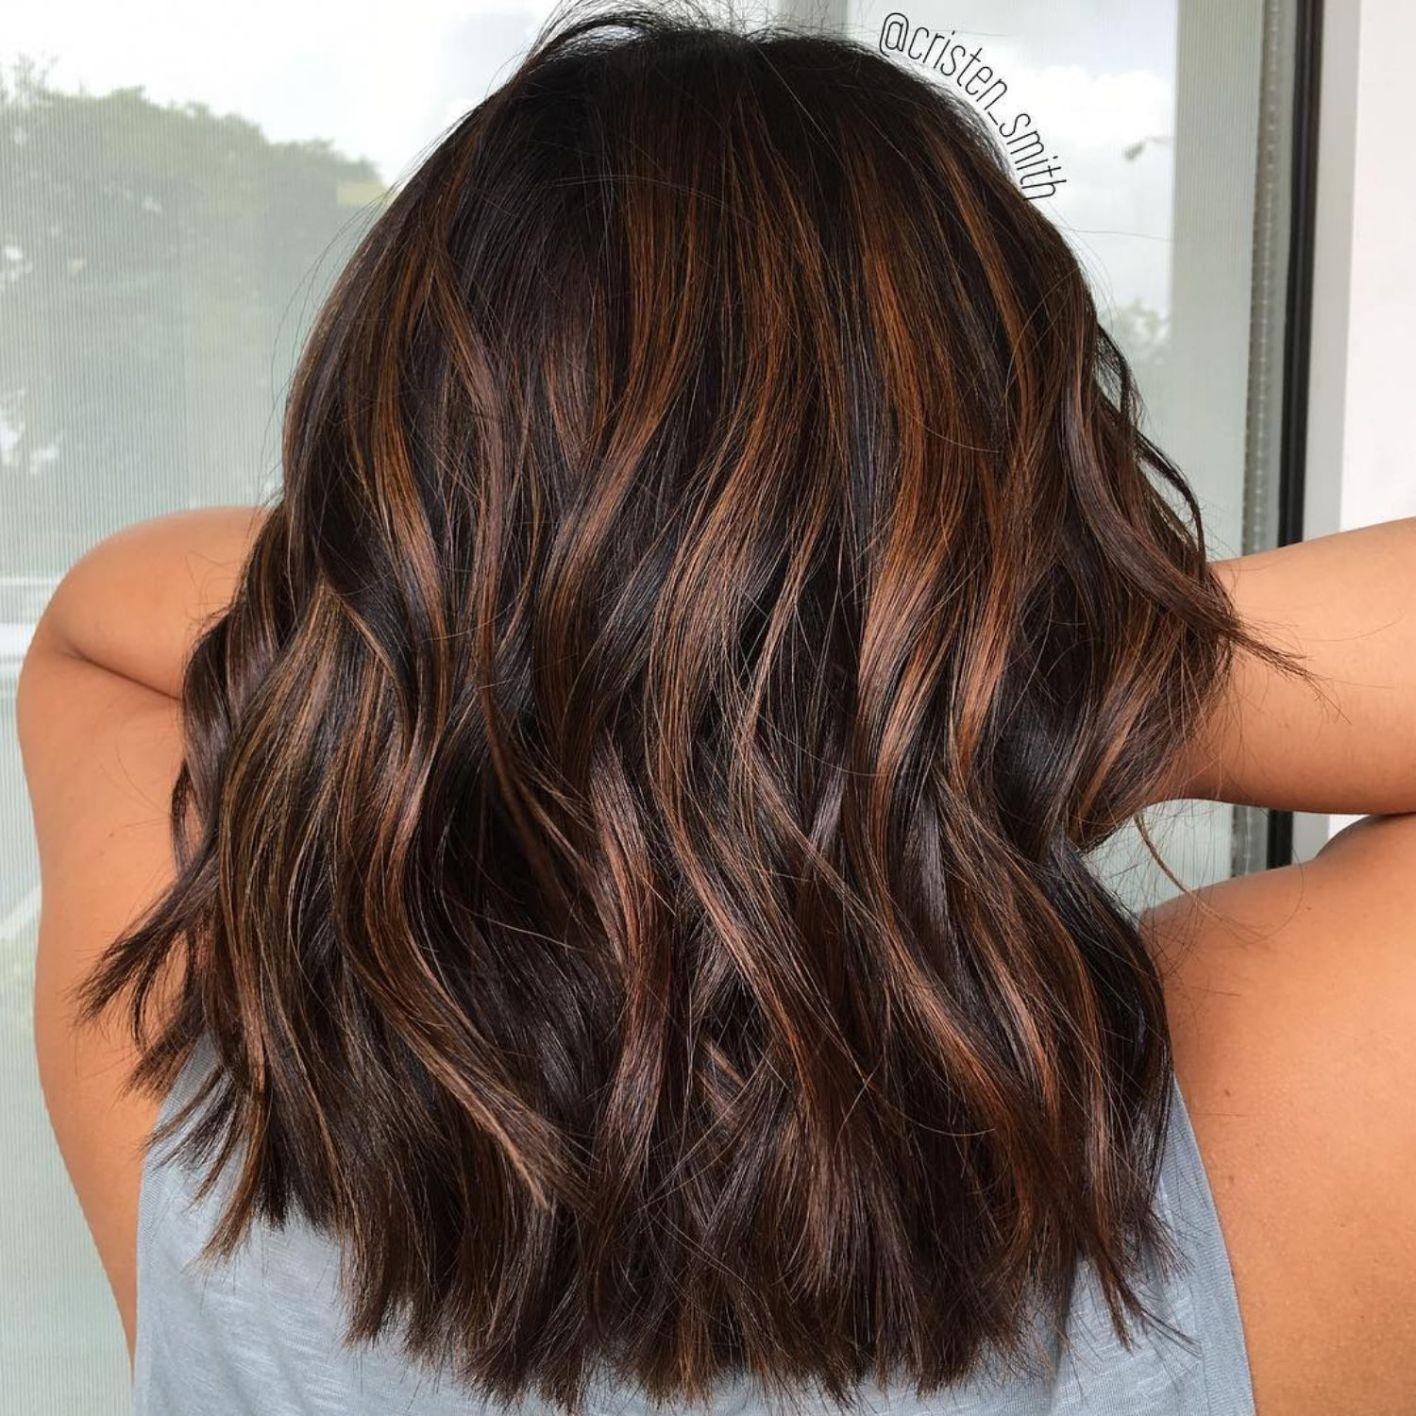 60 Hairstyles Featuring Dark Brown Hair With Highlights Brown Hair With Highlights Hair Highlights Brown Hair Balayage